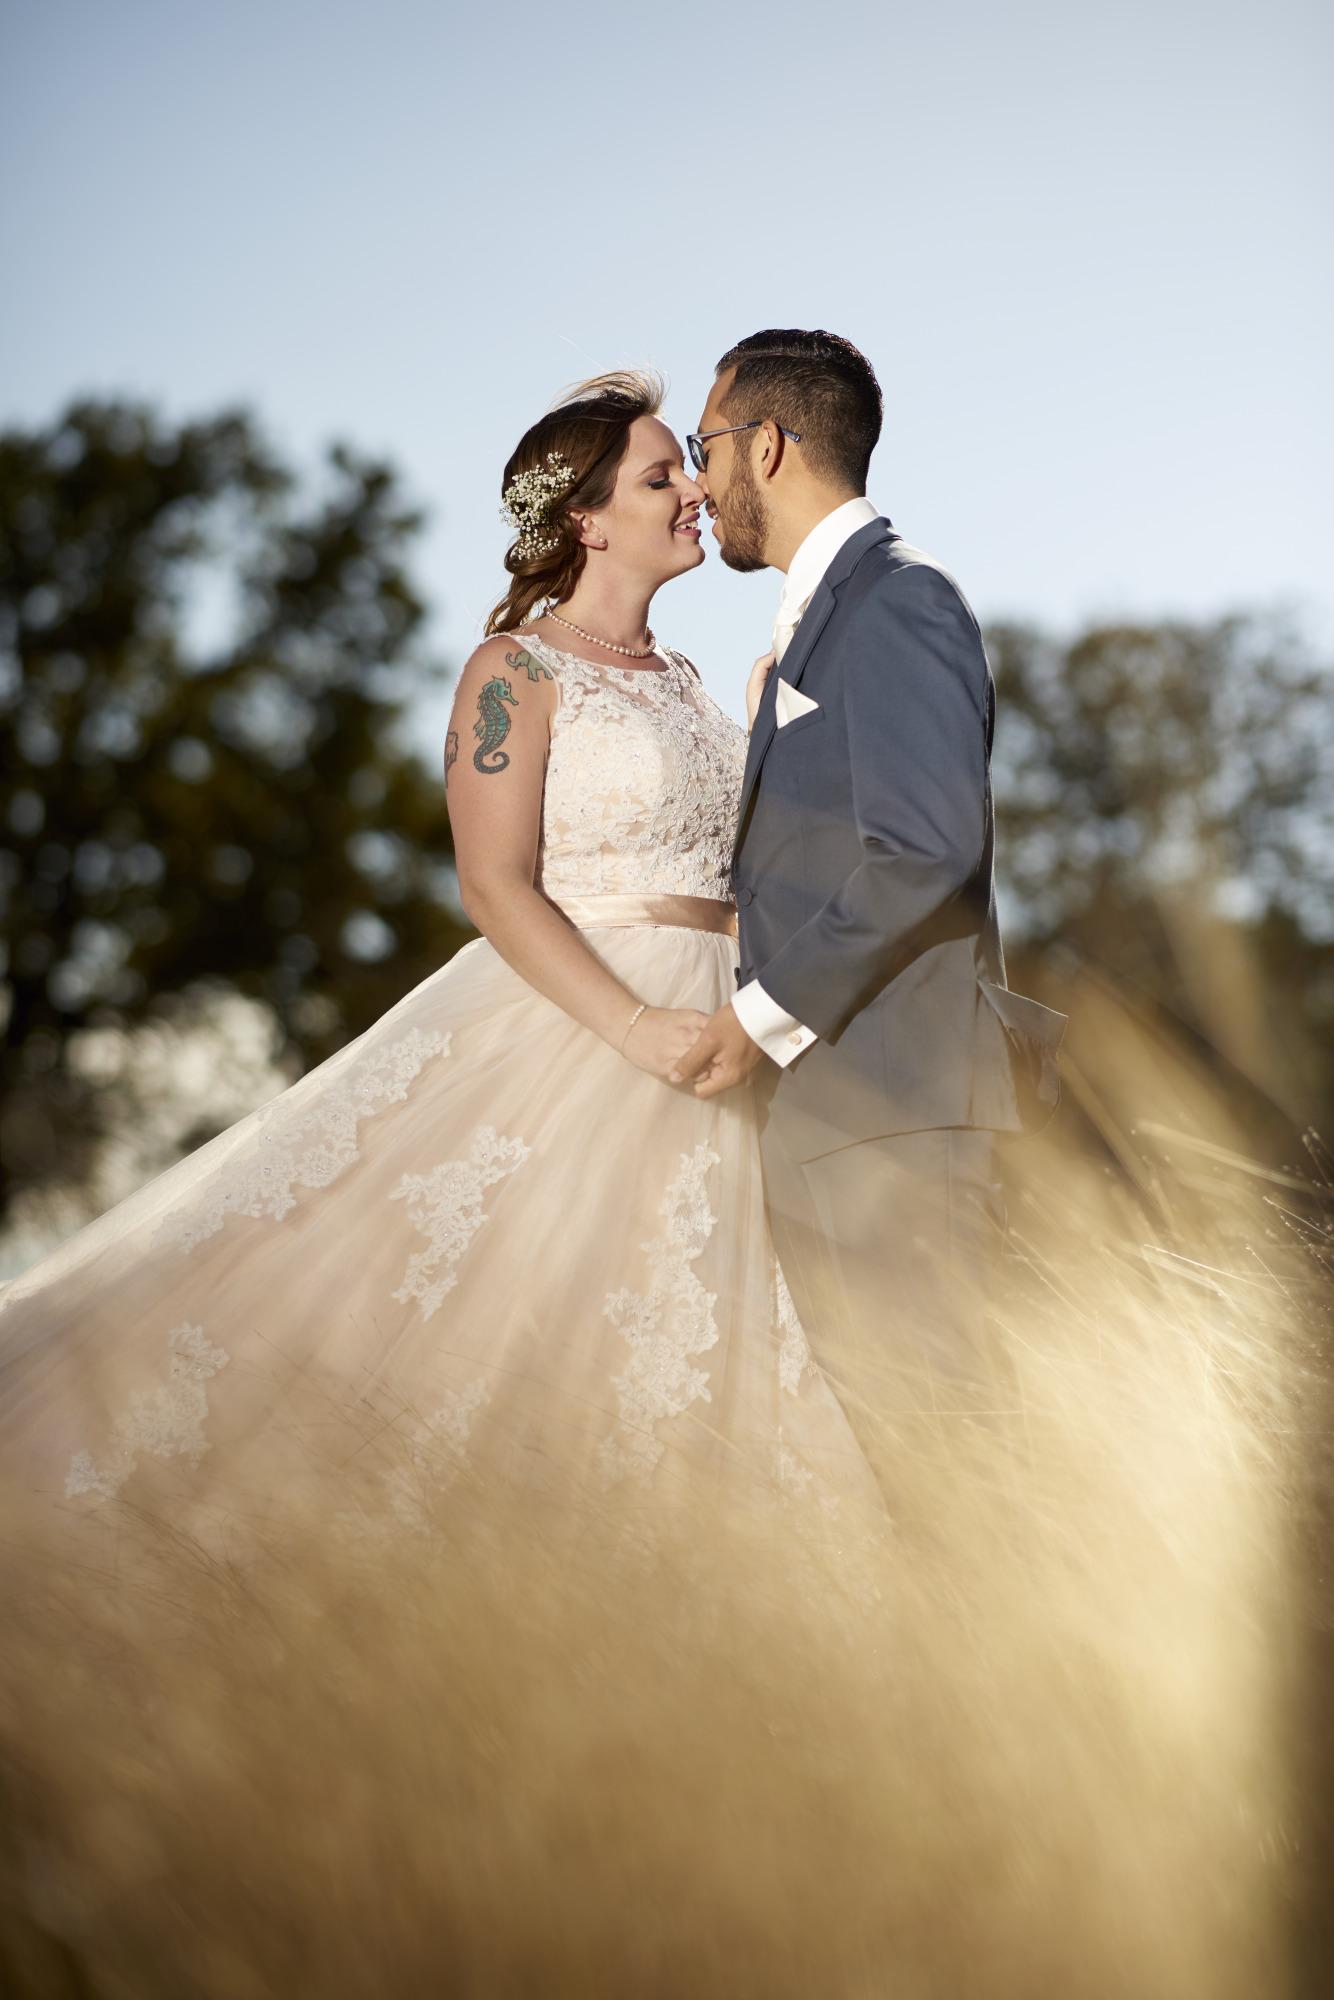 Austin Wedding Video Packages - Austin Wedding Videographers